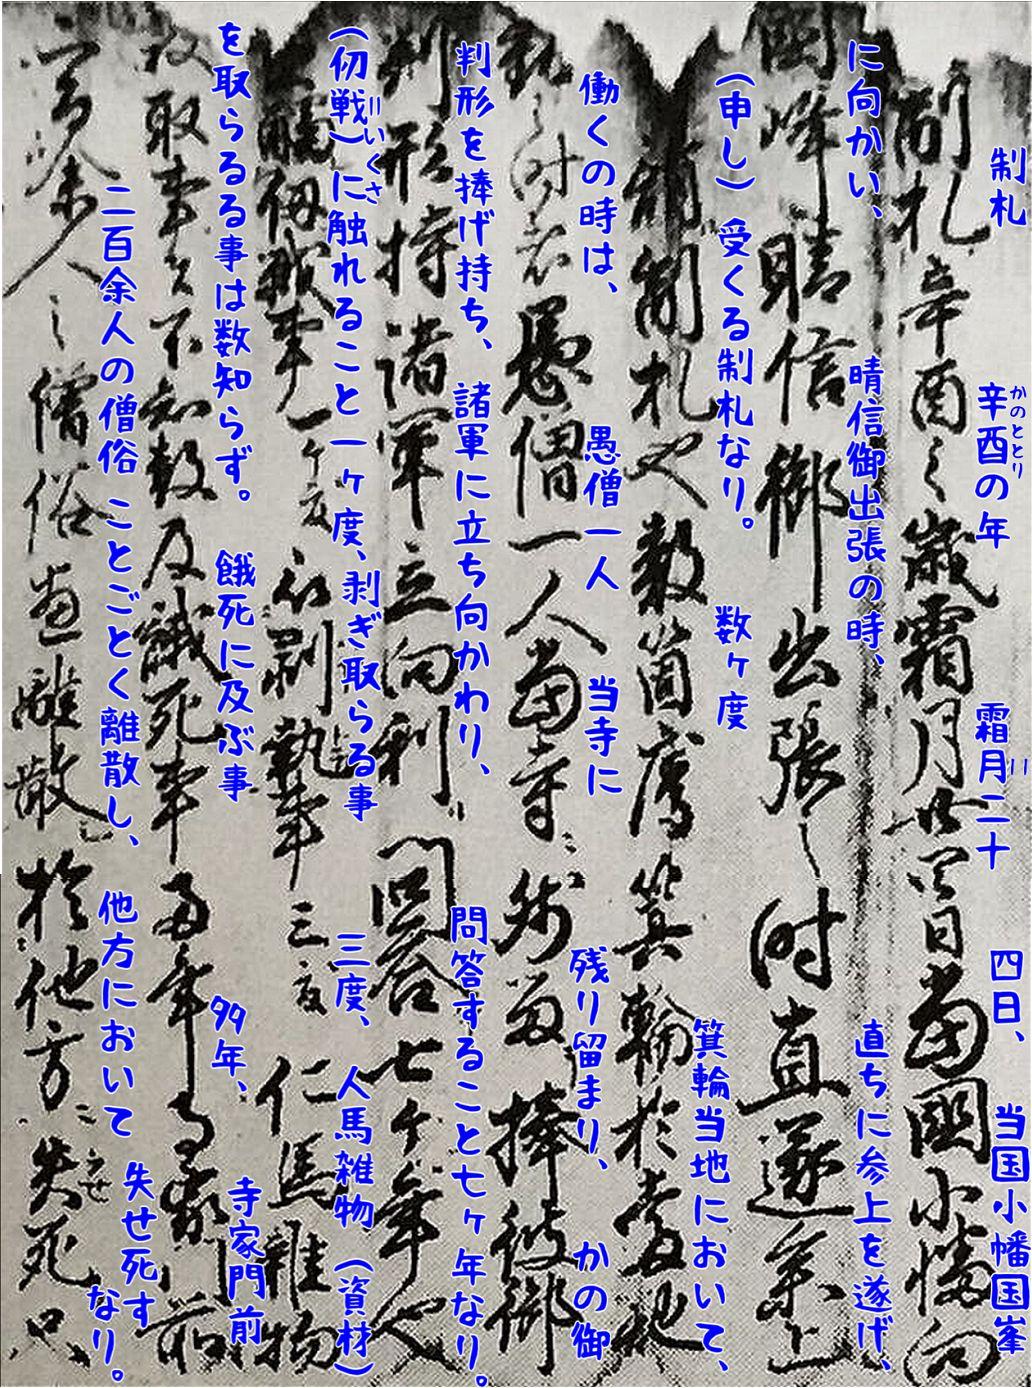 永禄十年三月七日付け受連覚書(a+書き下し文)